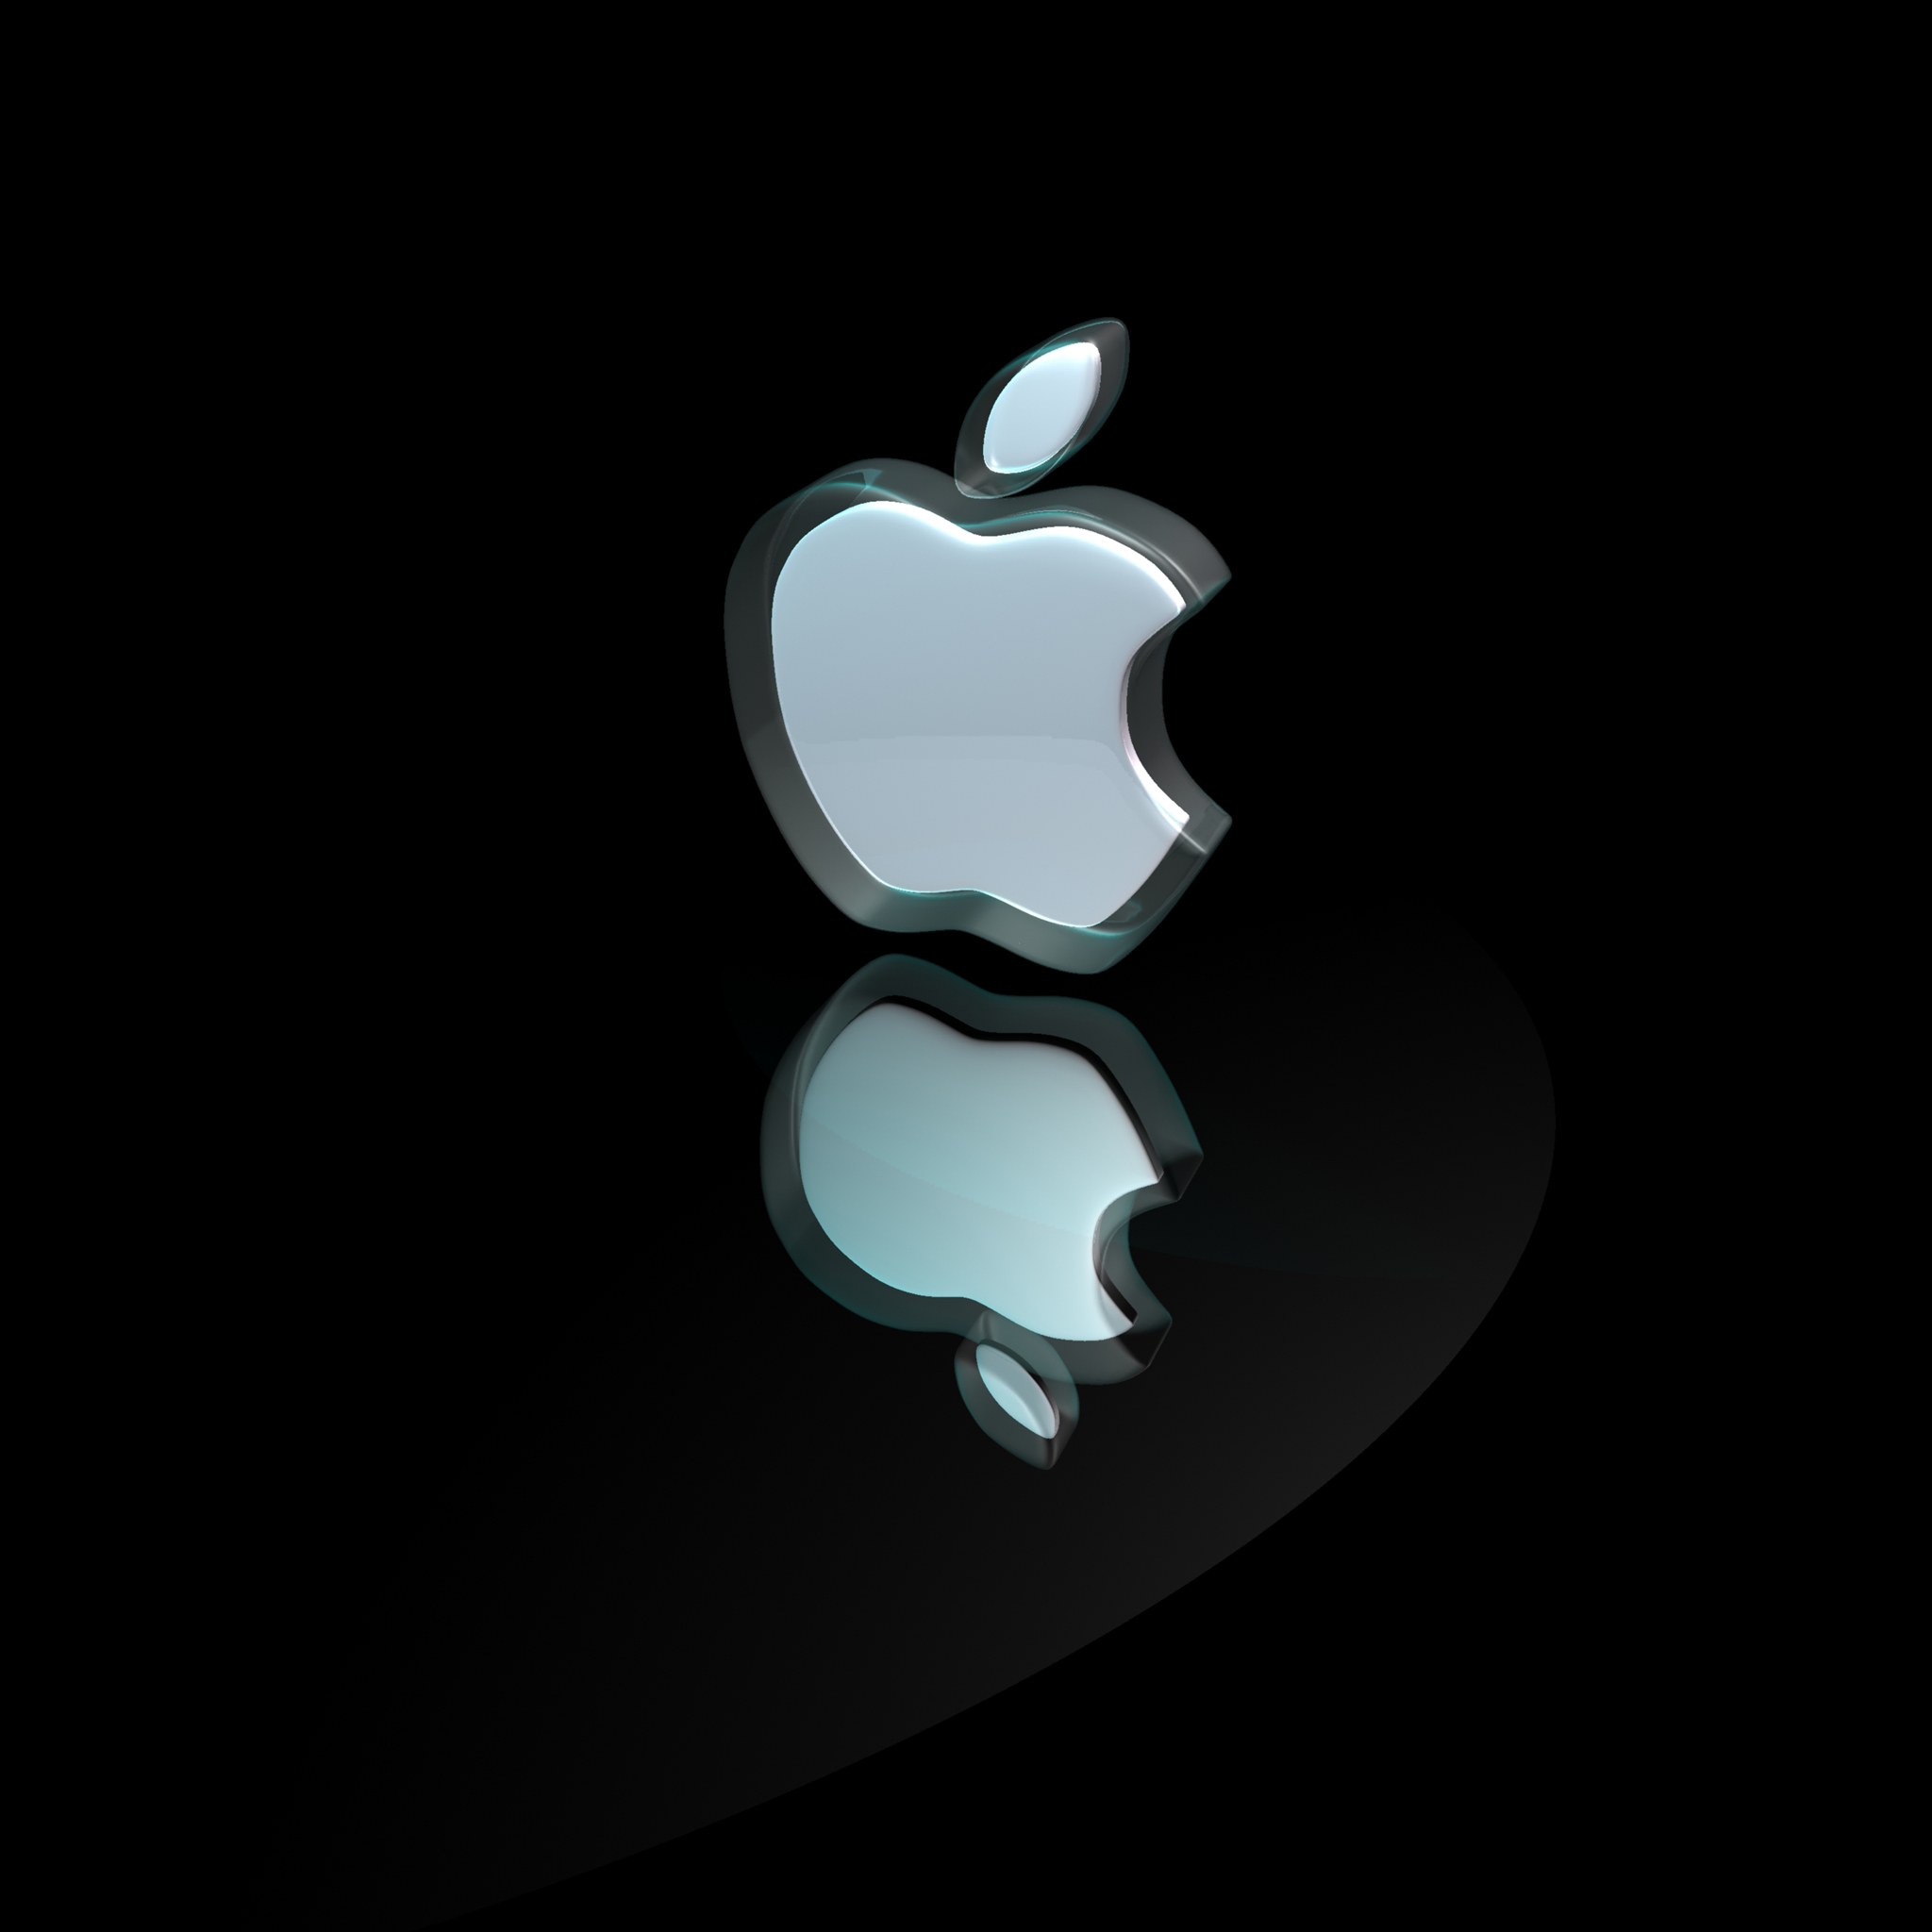 3D-Apple-3Wallpapers-iPad